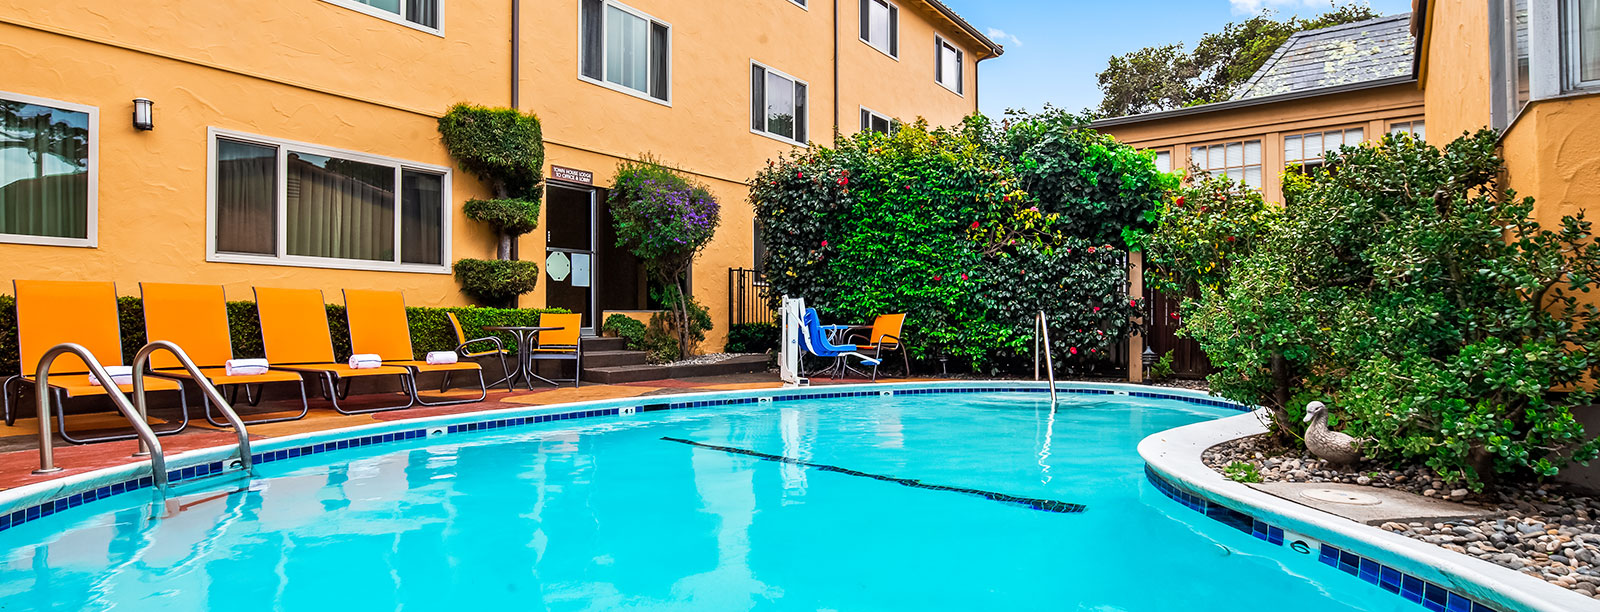 exclusive carmel hotel vacation deals best western carmel. Black Bedroom Furniture Sets. Home Design Ideas